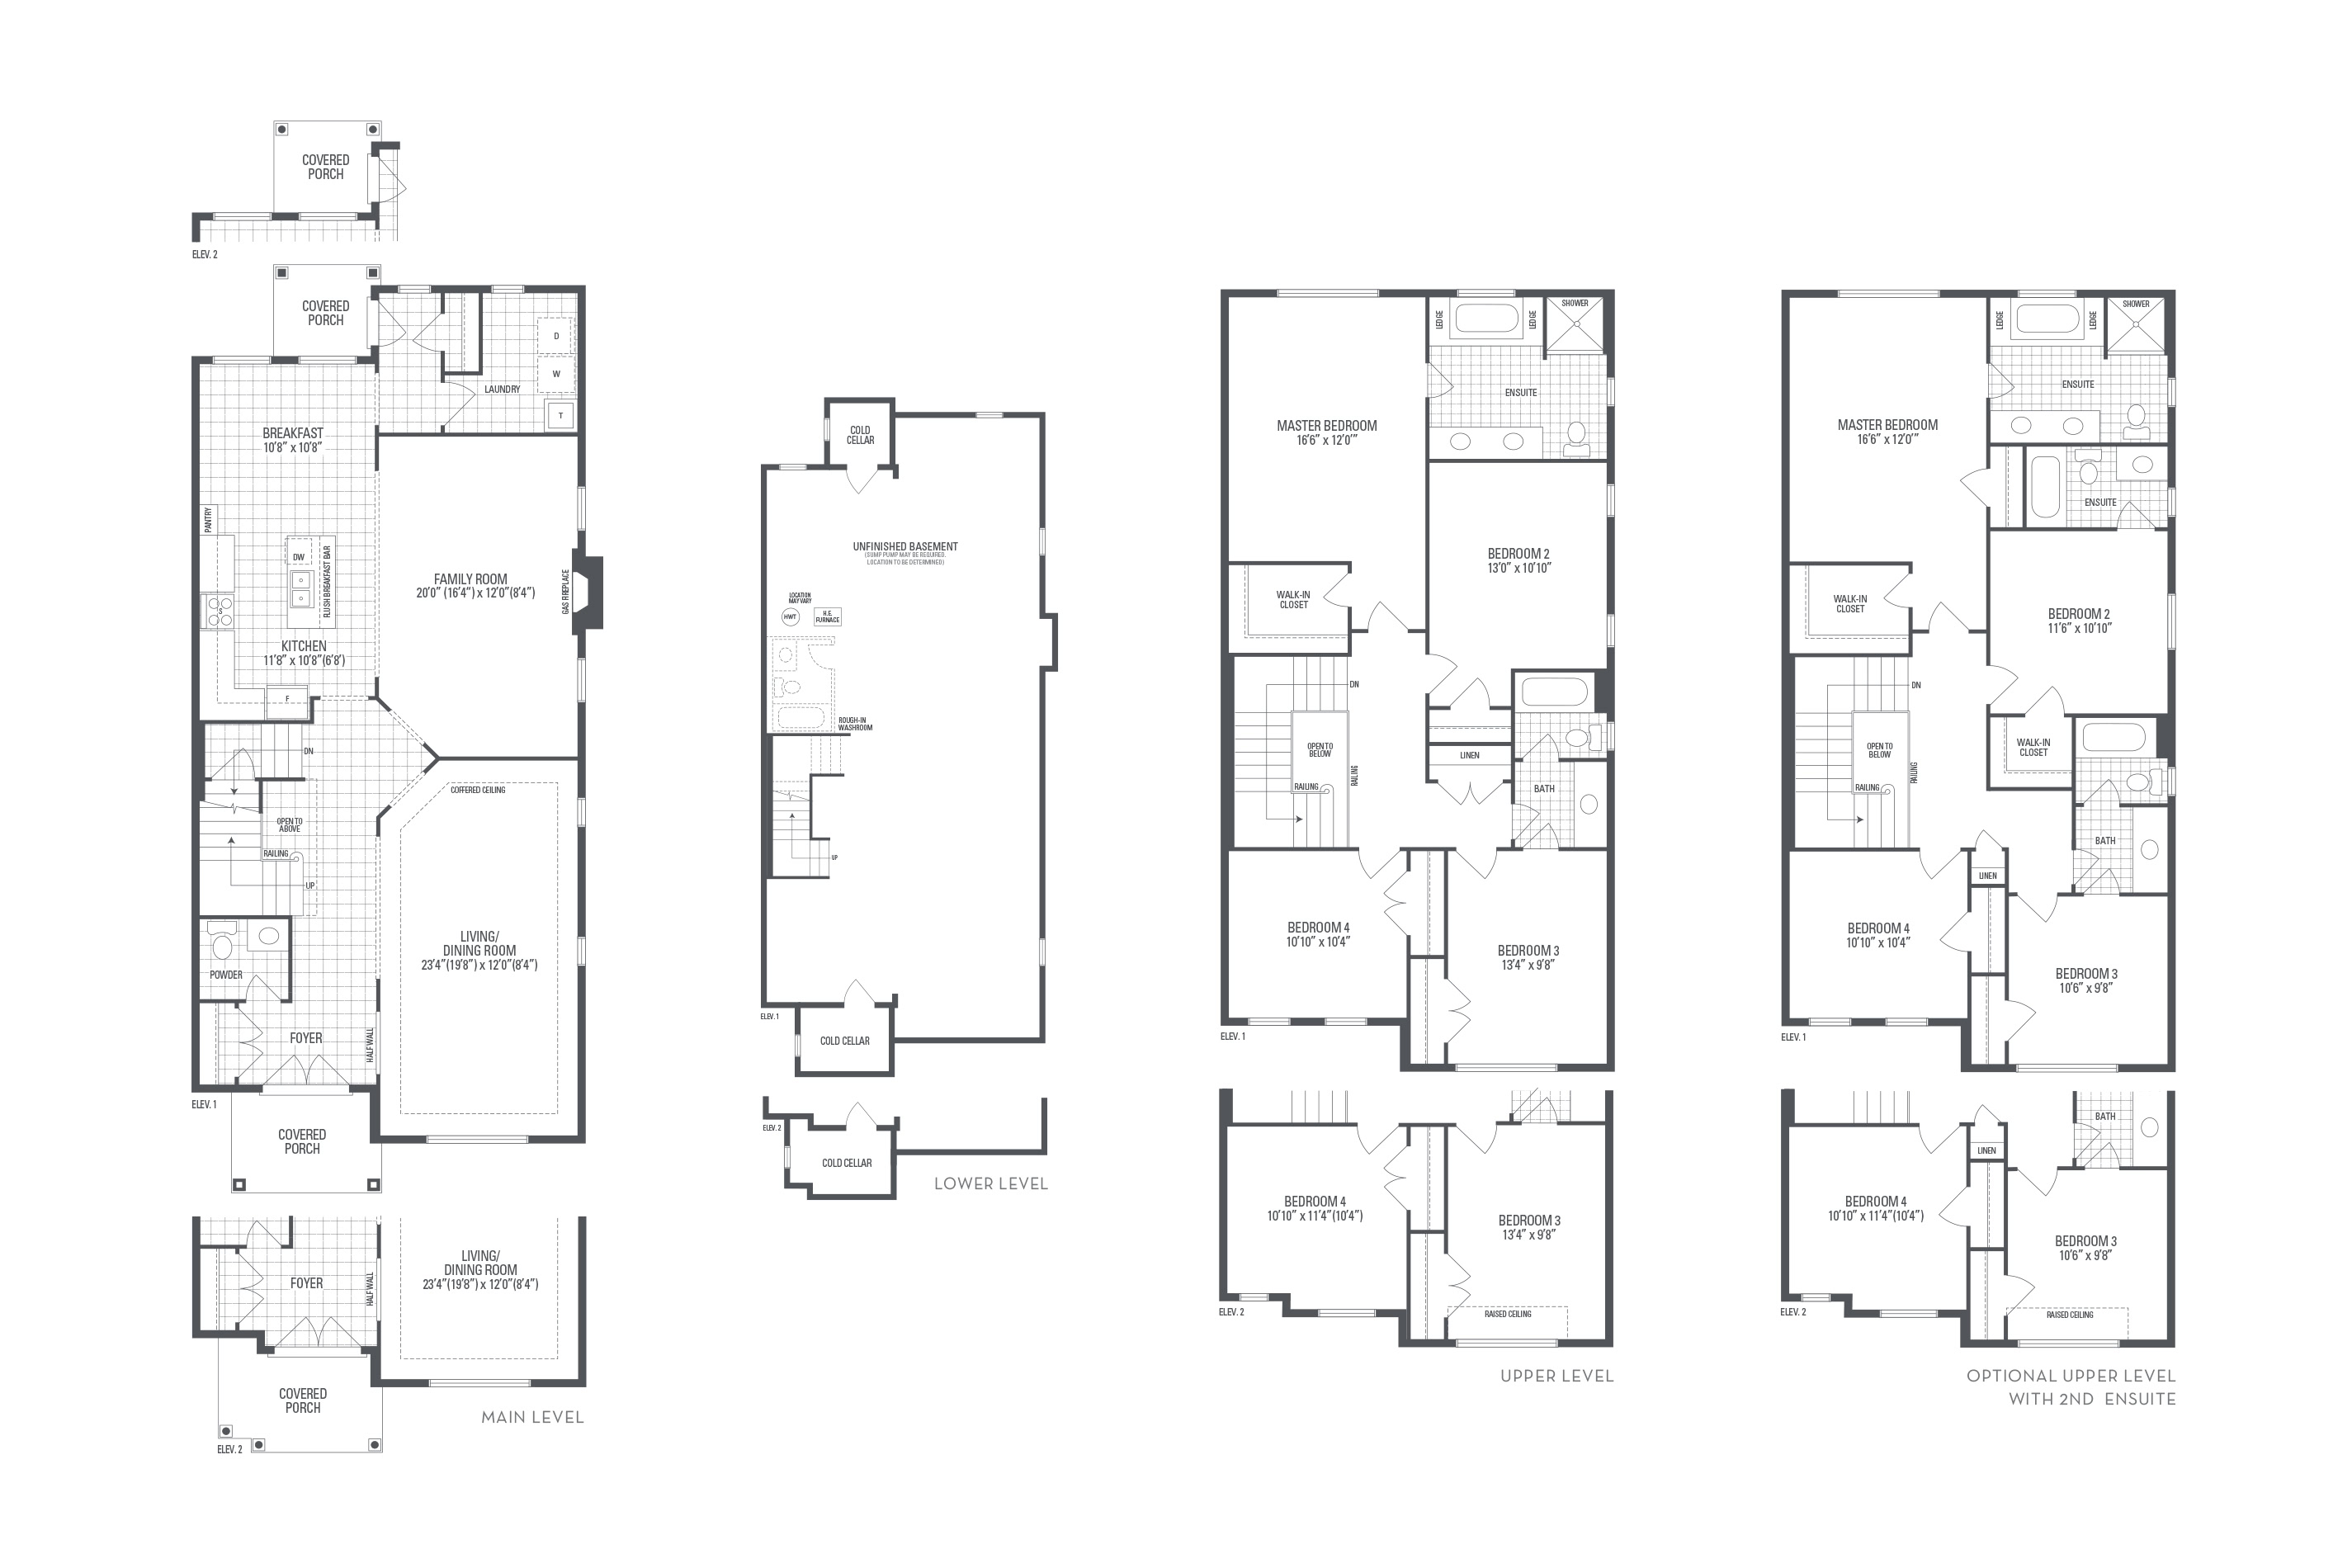 Savana 01 Elev. 1 Floorplan Thumbnail